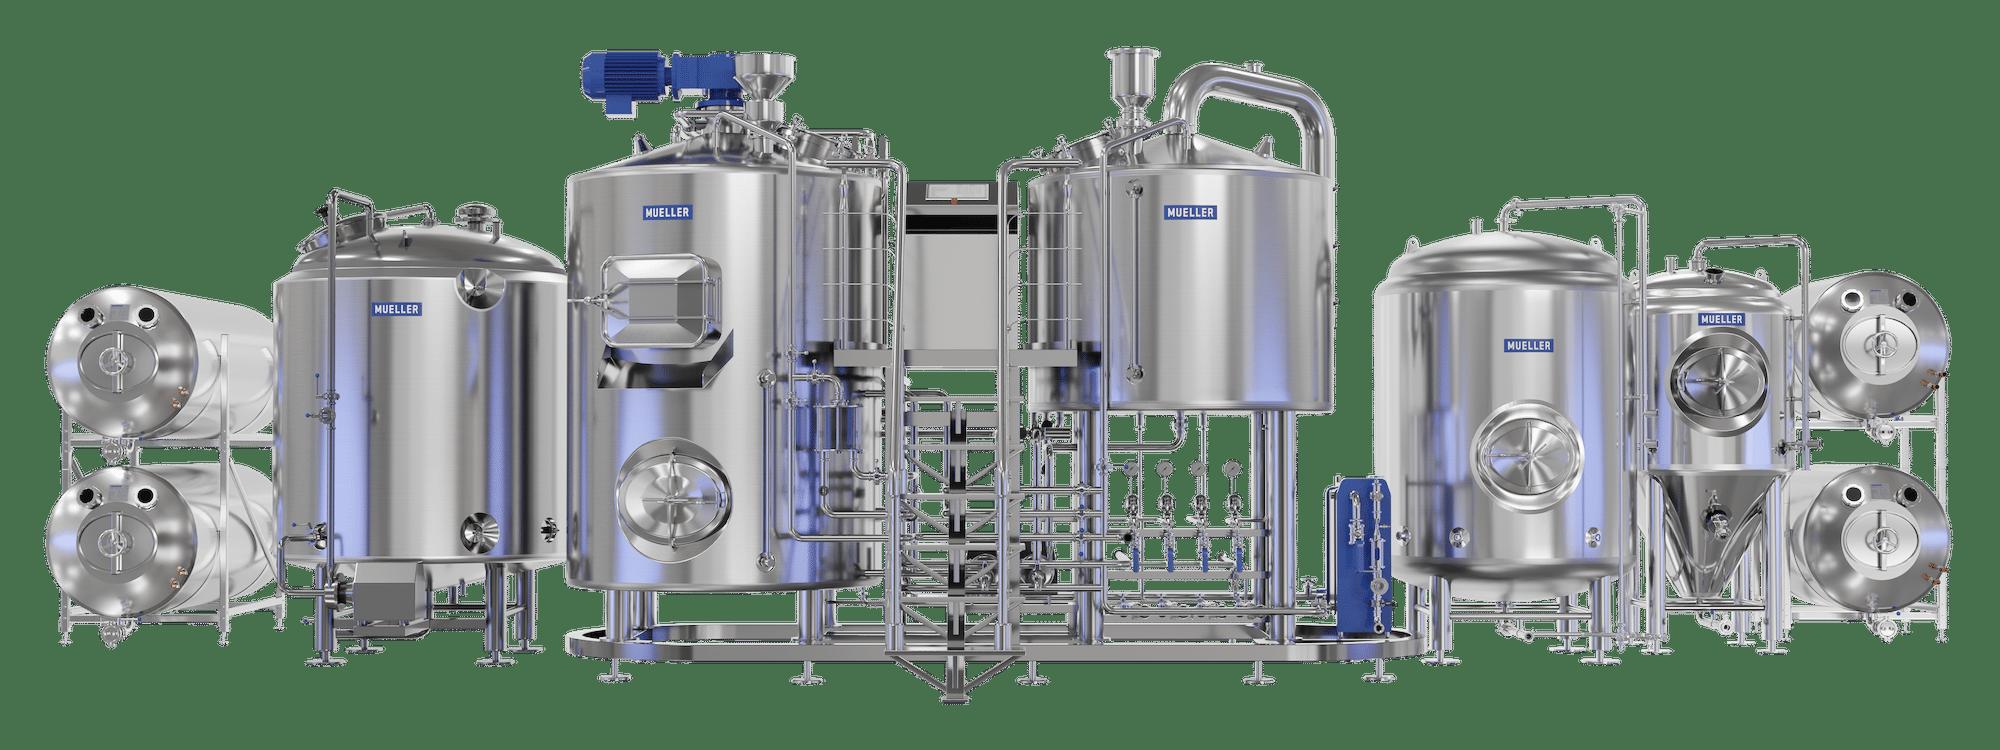 paul-mueller-beer-genius-family-of-products-photo-8-23-2021